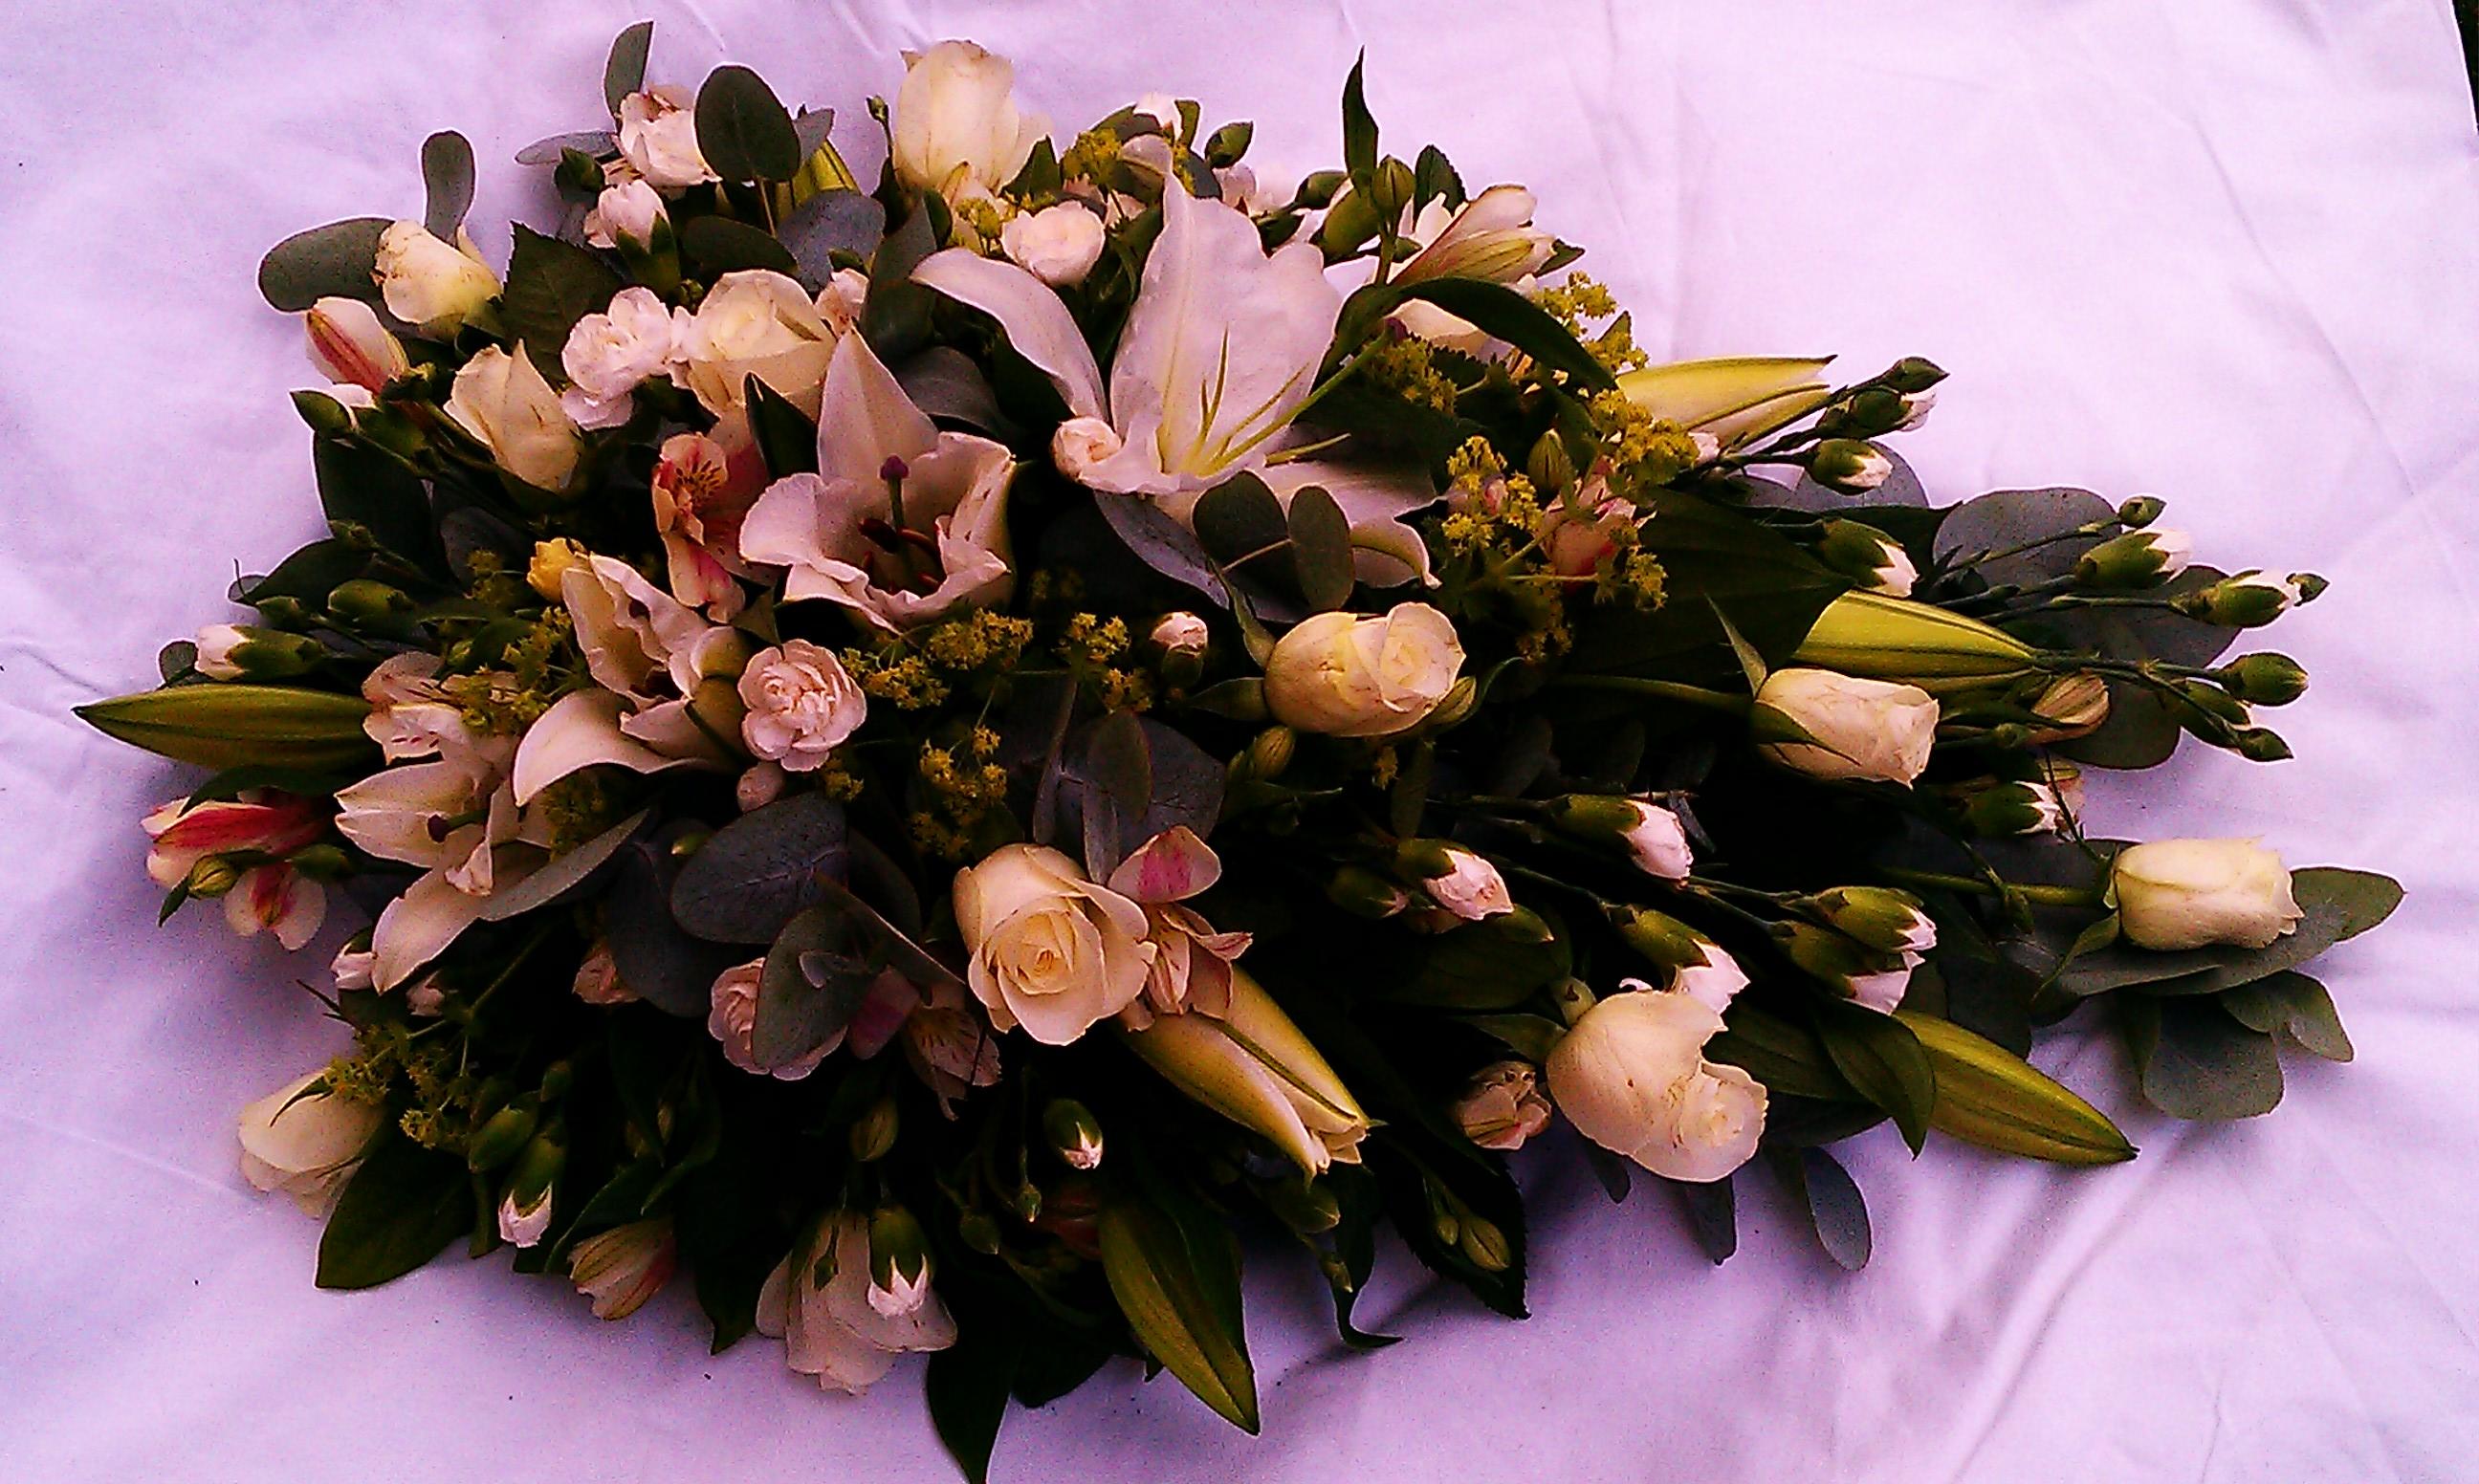 Florist in Desborough